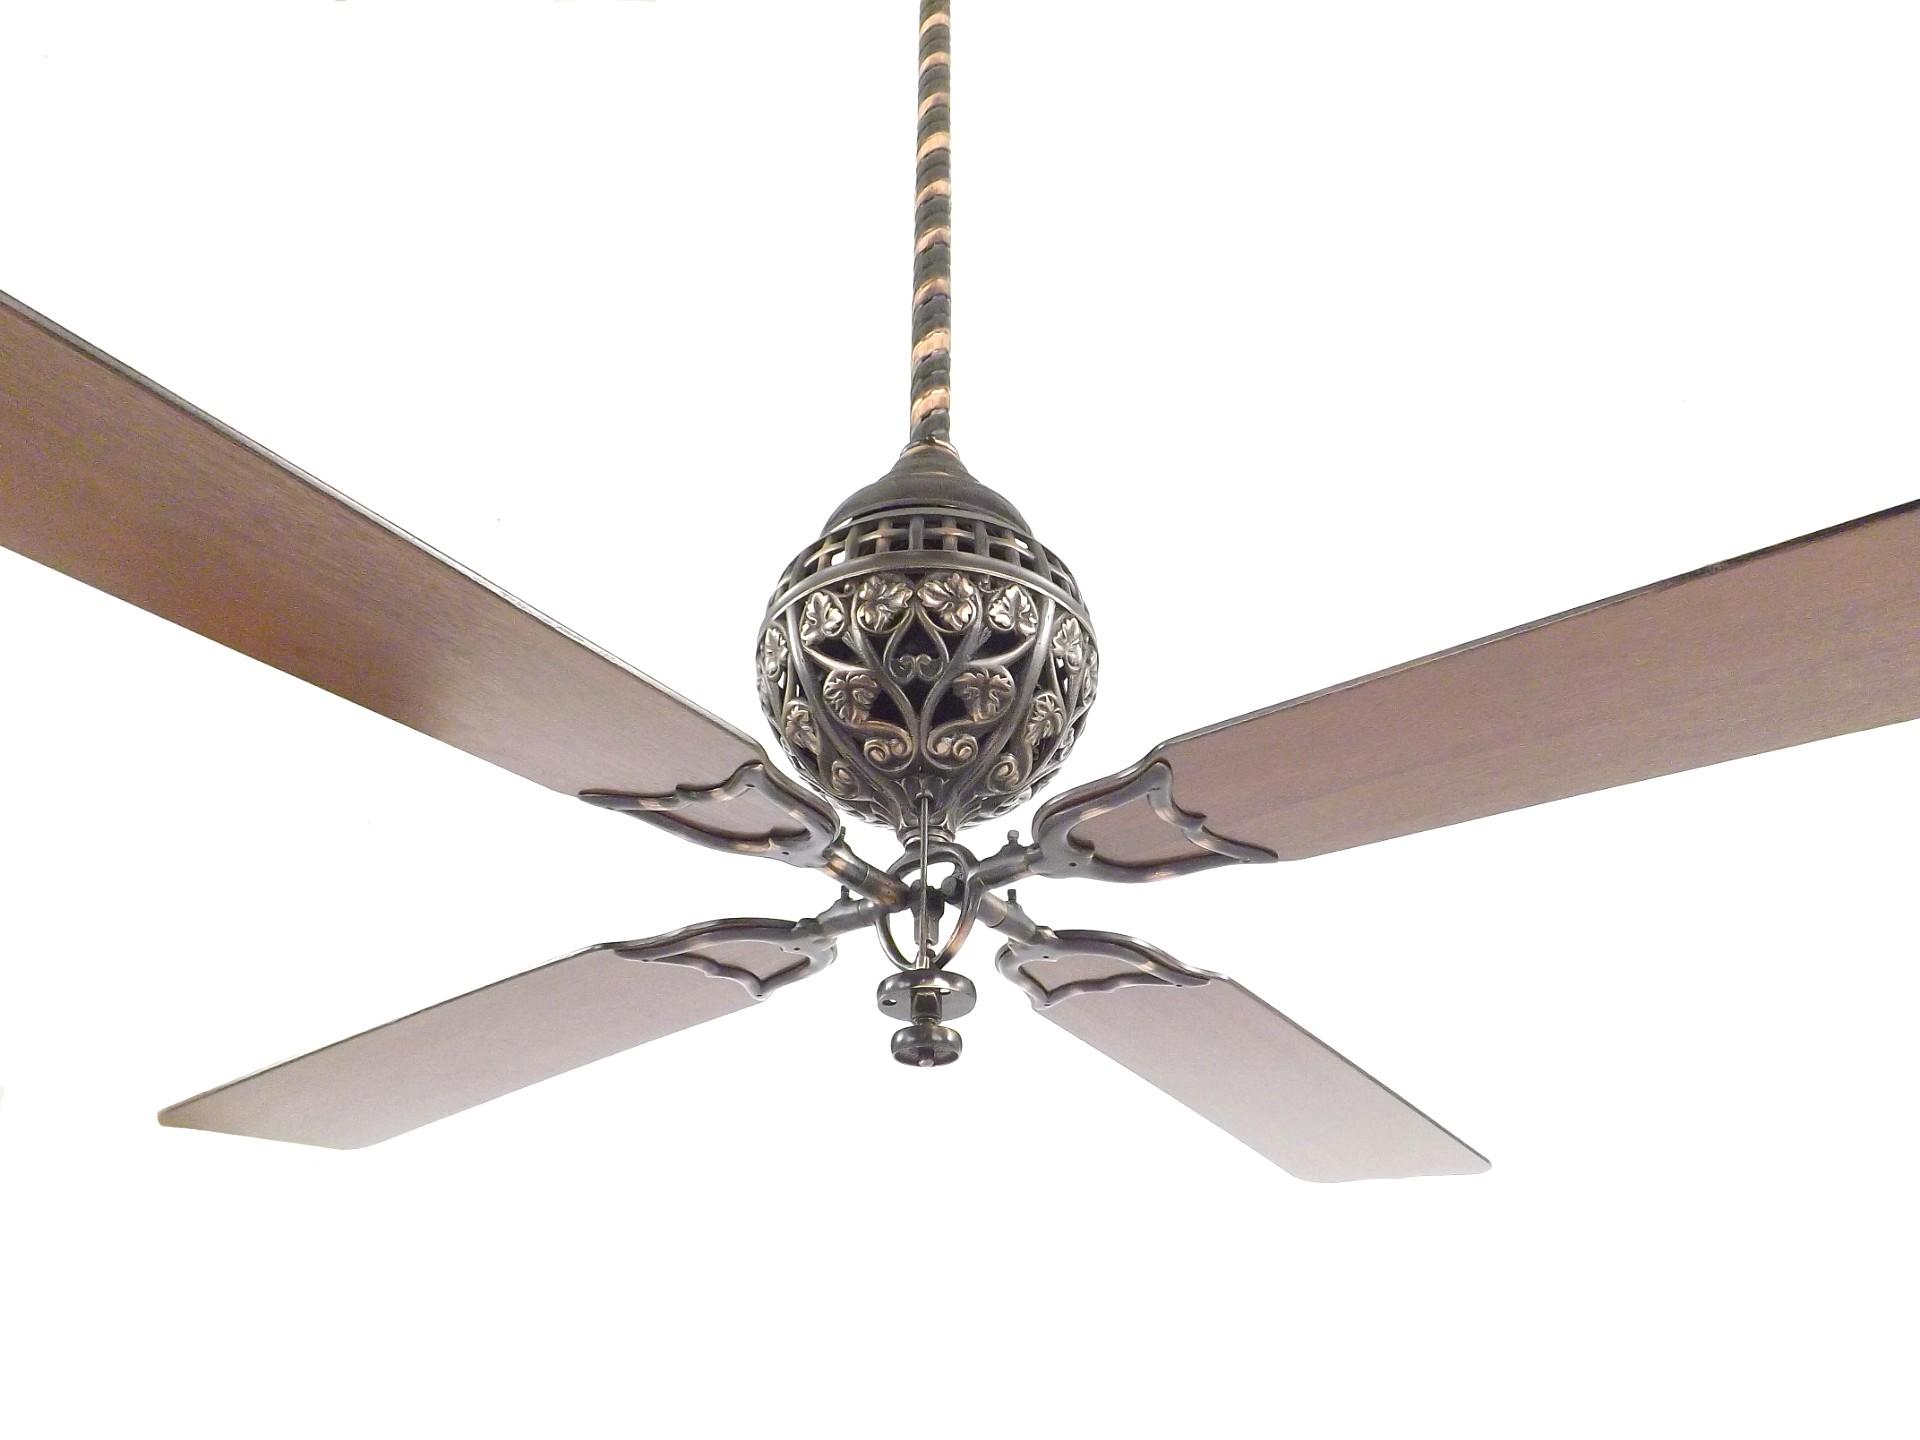 Restored 1898 Hunter Tuerk 4 Blade Ceiling Fan